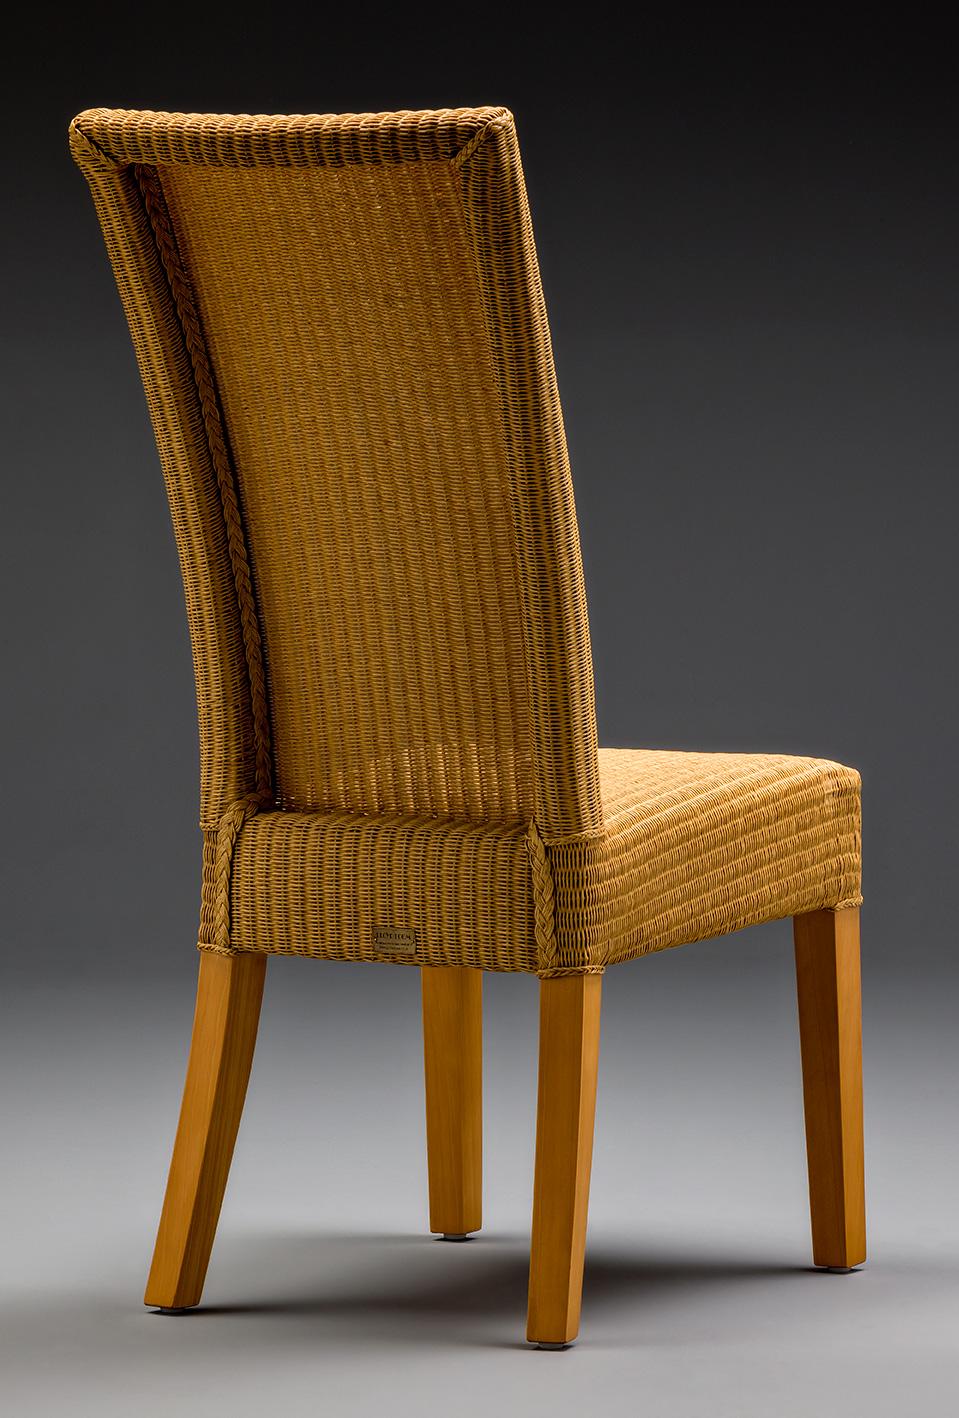 Lloyd Loom Fairview Dining Chair Lloyd Looms